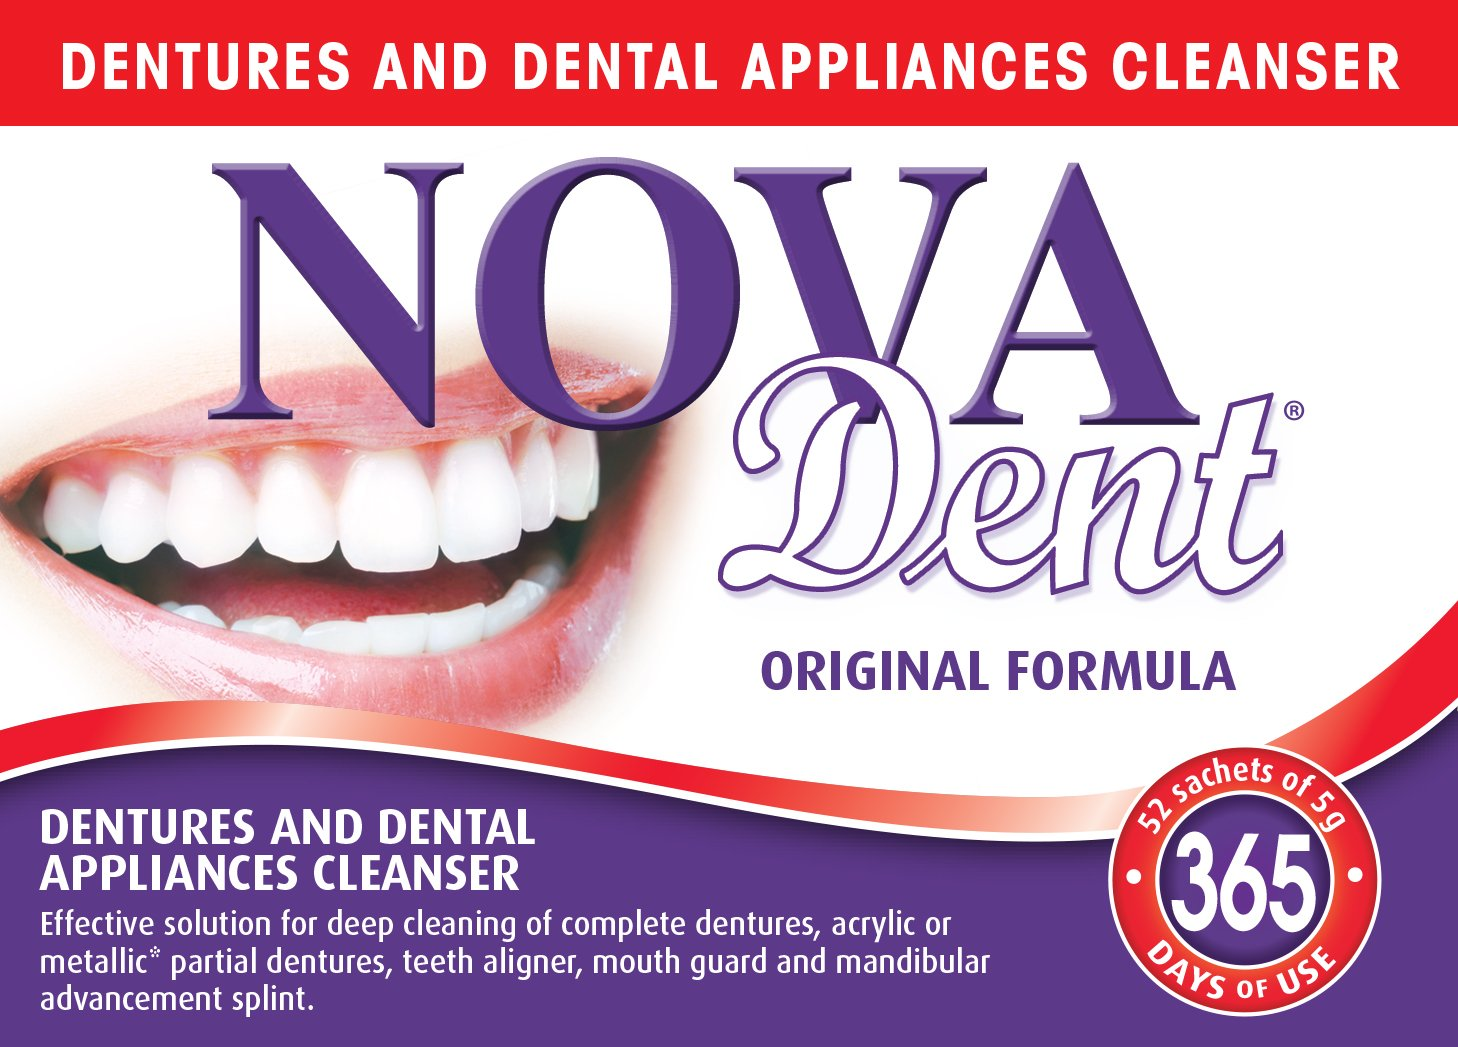 Novadent Original + FREE soaking bath | Dentures and dental appliances cleanser | 1 year (52 sachets) Novalab Canada inc.